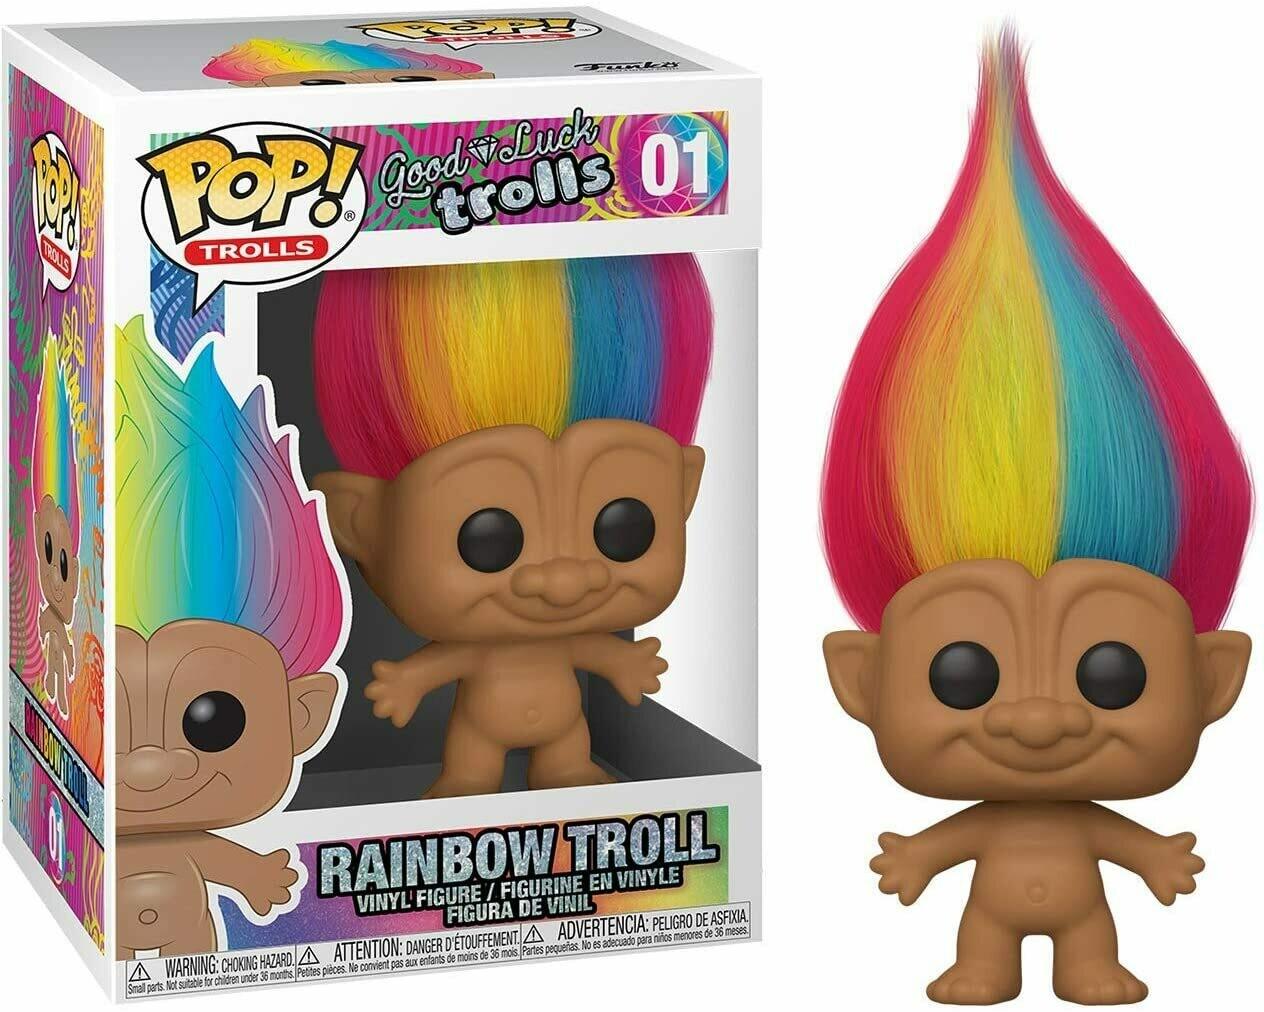 Funko Pop! Rainbow Troll